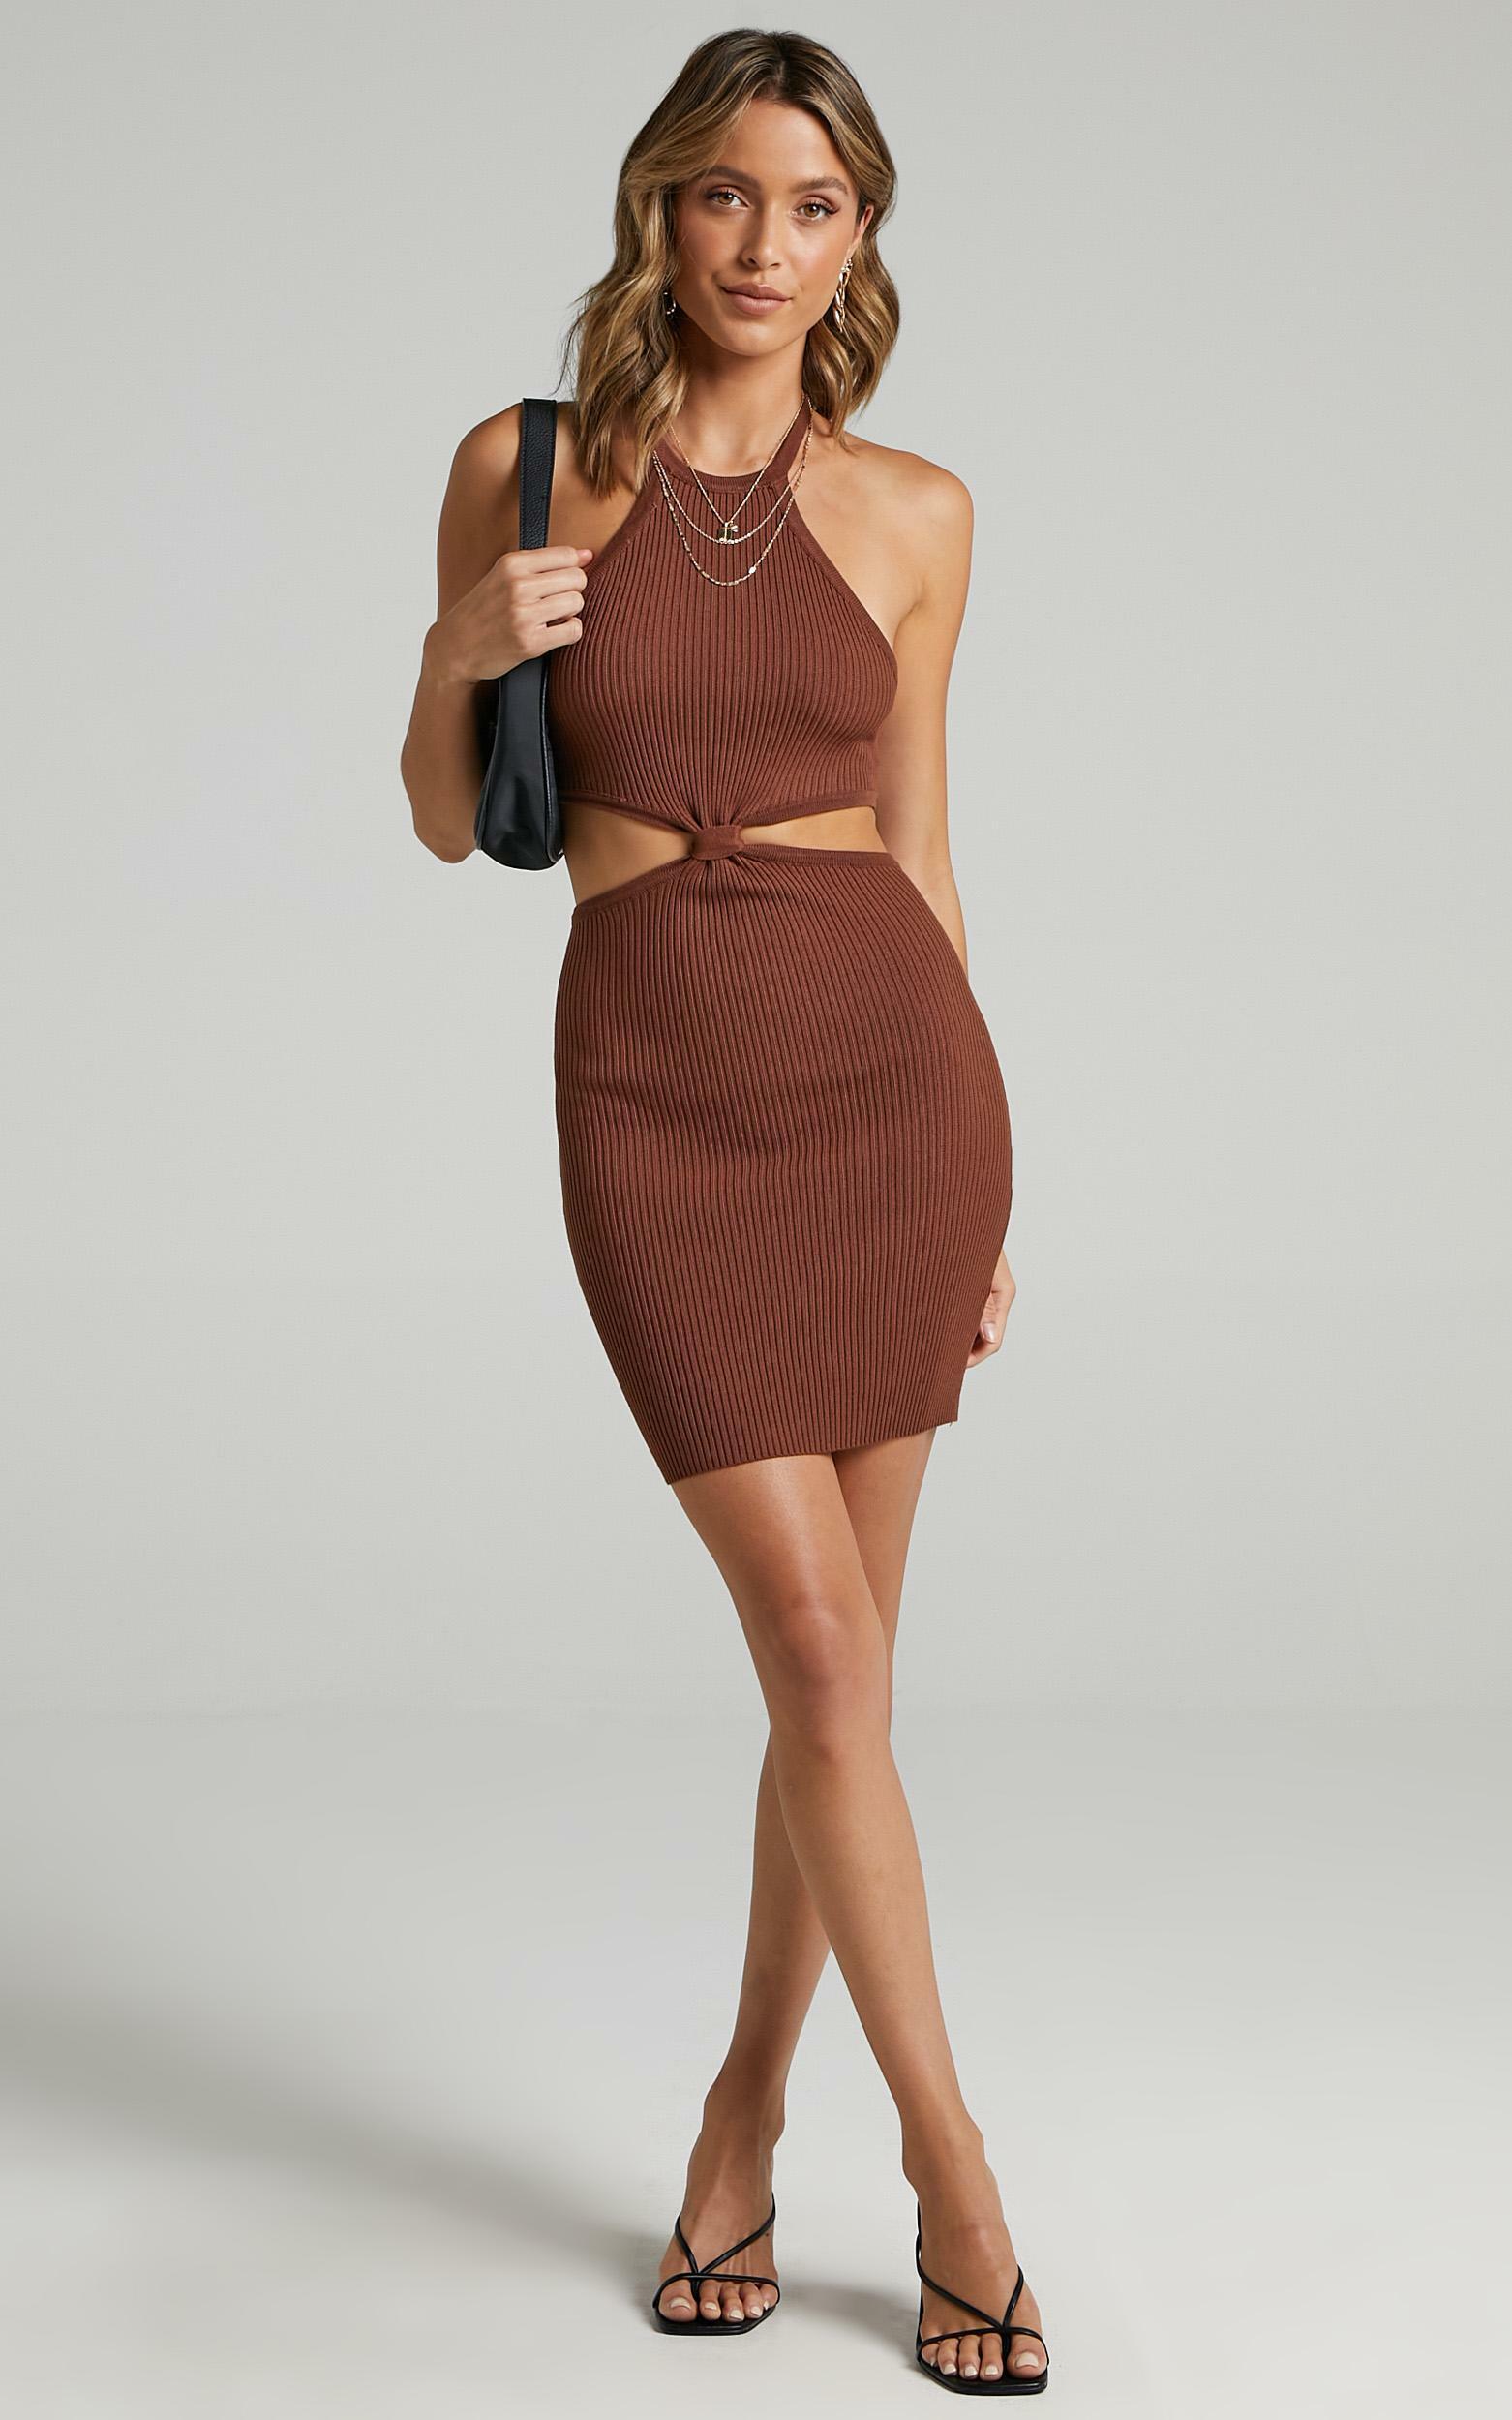 Demascio Dress in Brown - 06, BRN1, hi-res image number null